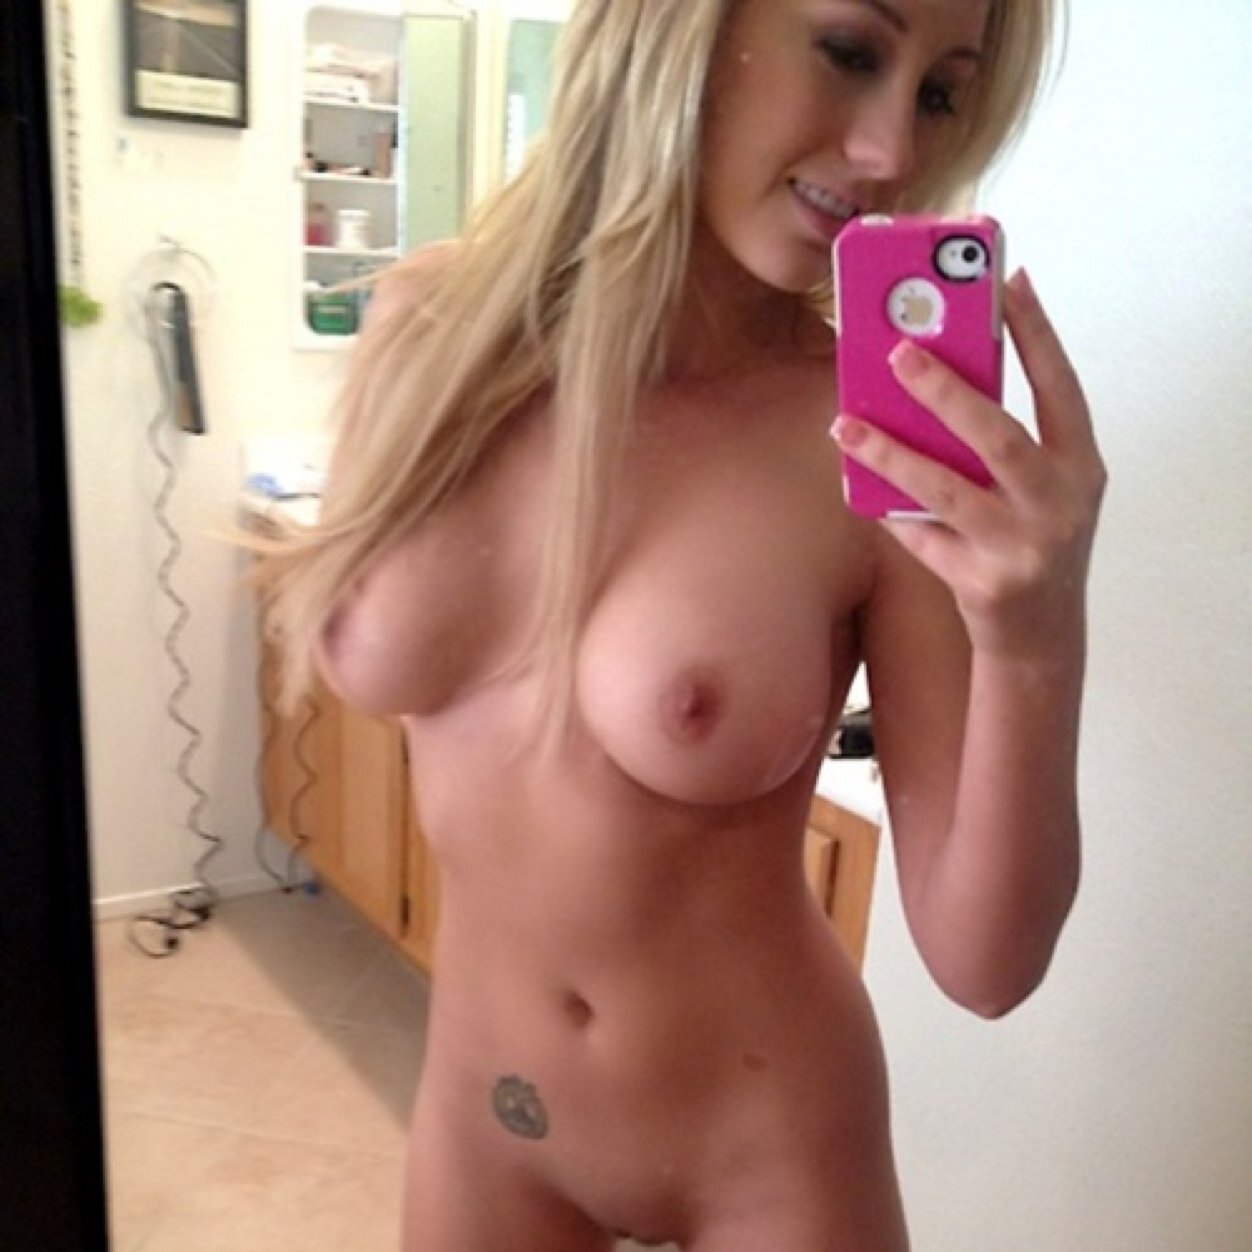 sexy-topless-girl-selfies-3